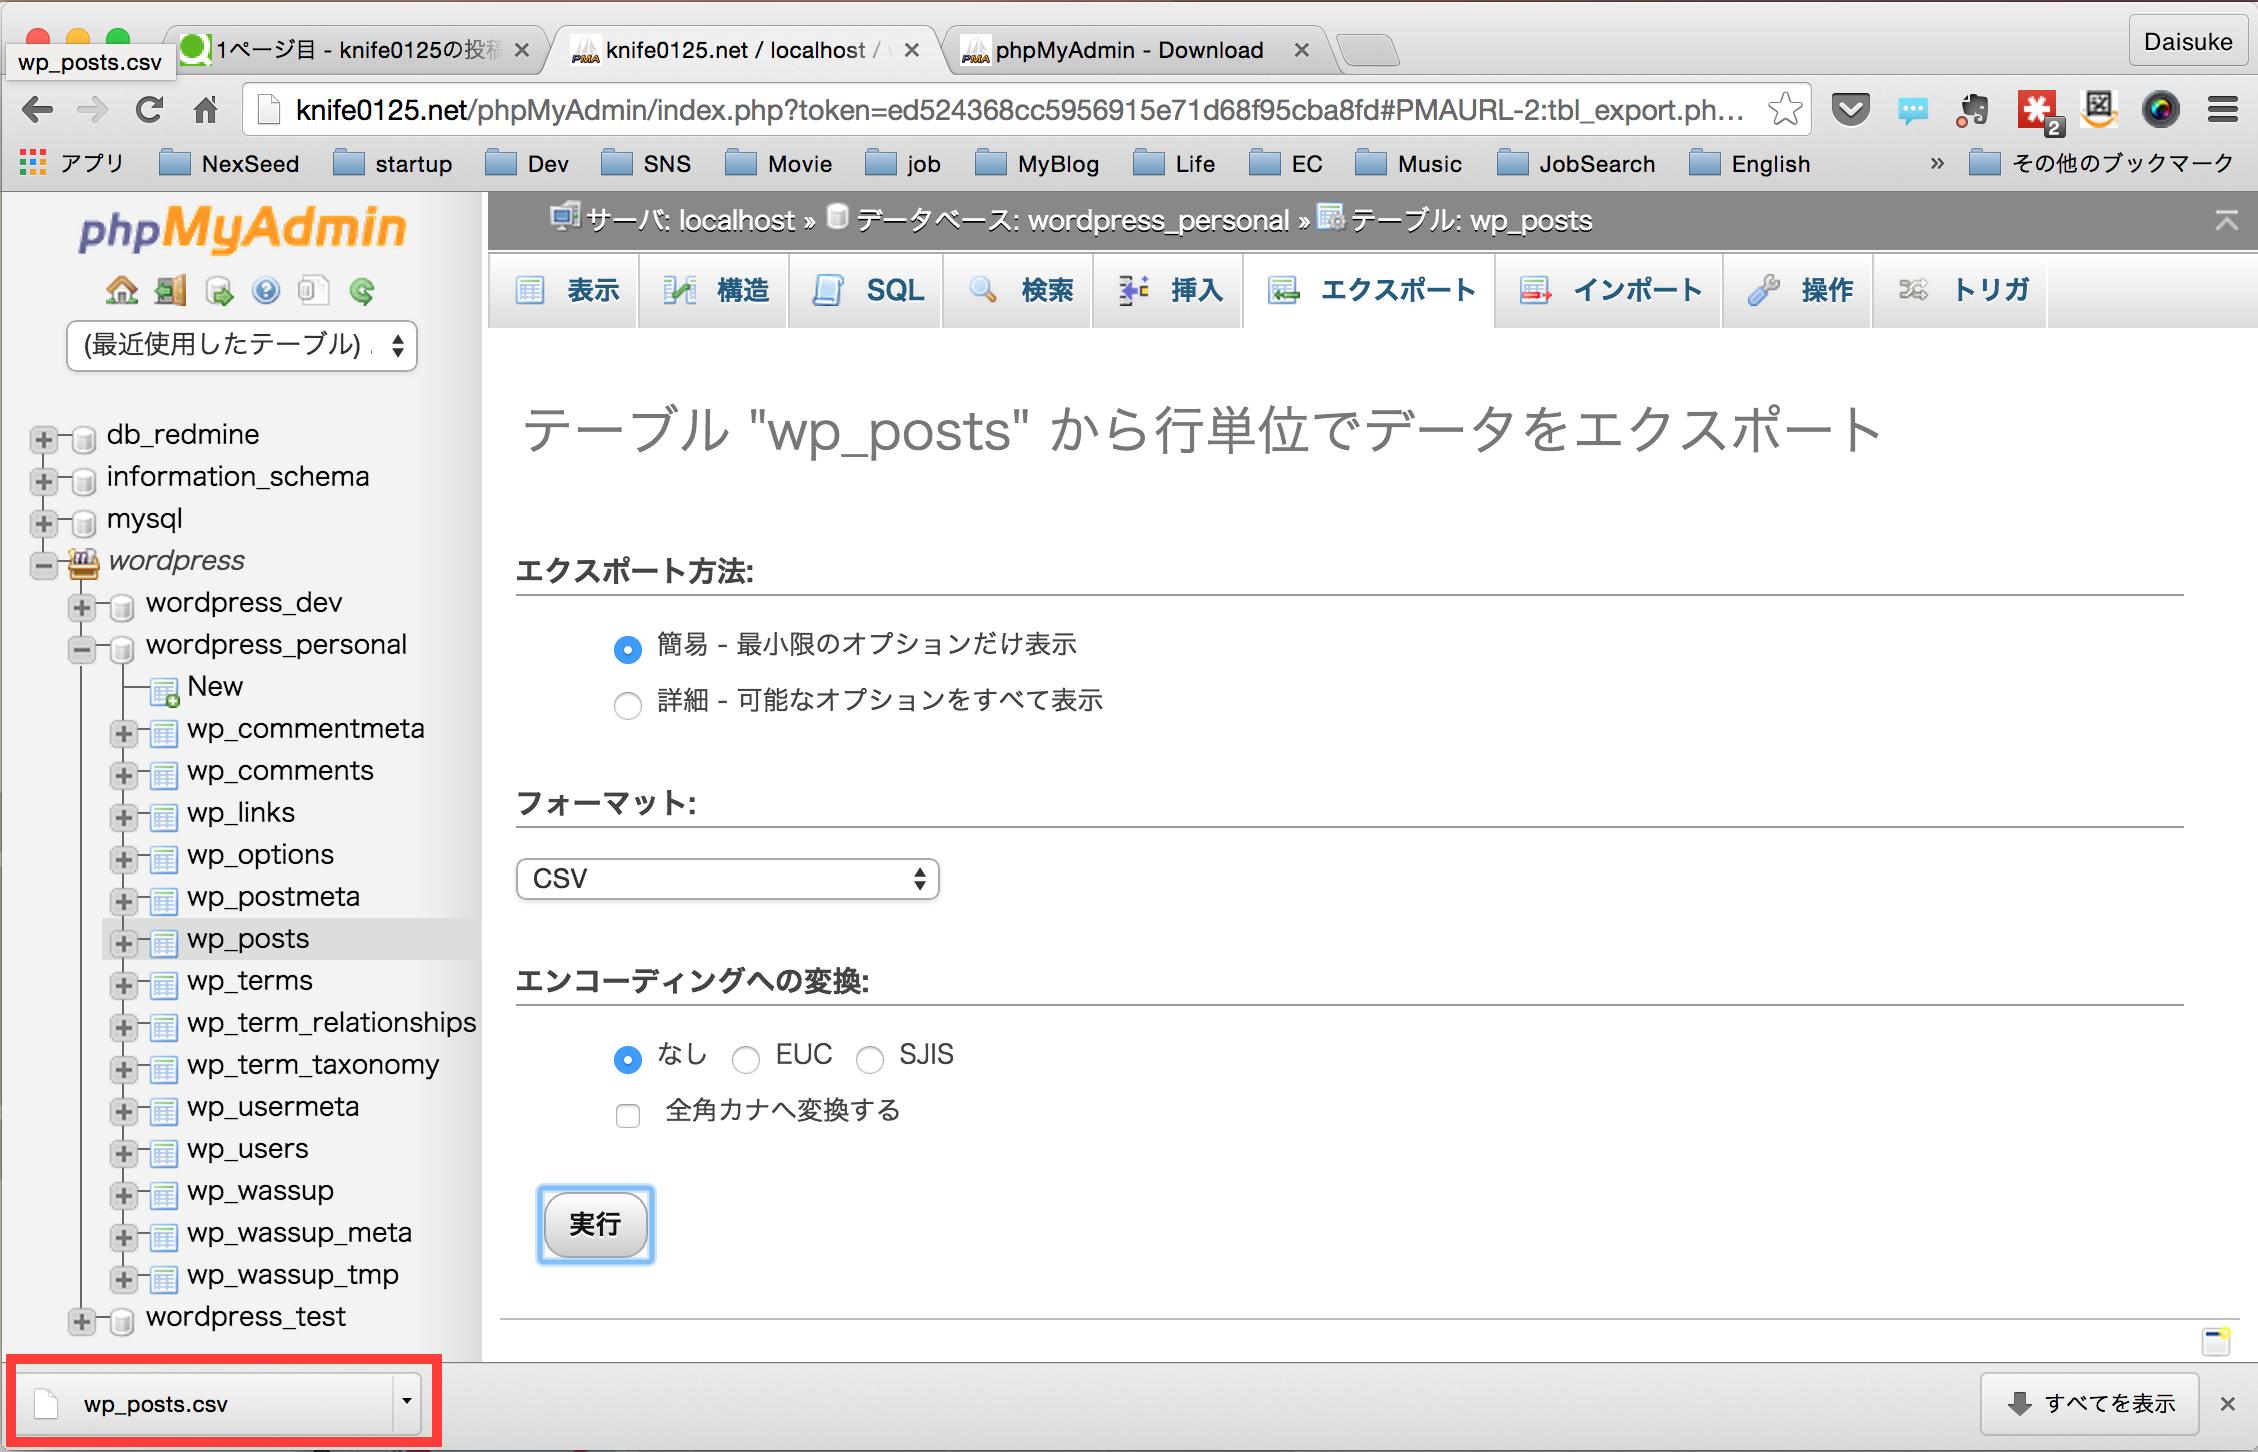 PHPMyAdmin_Export_09.png